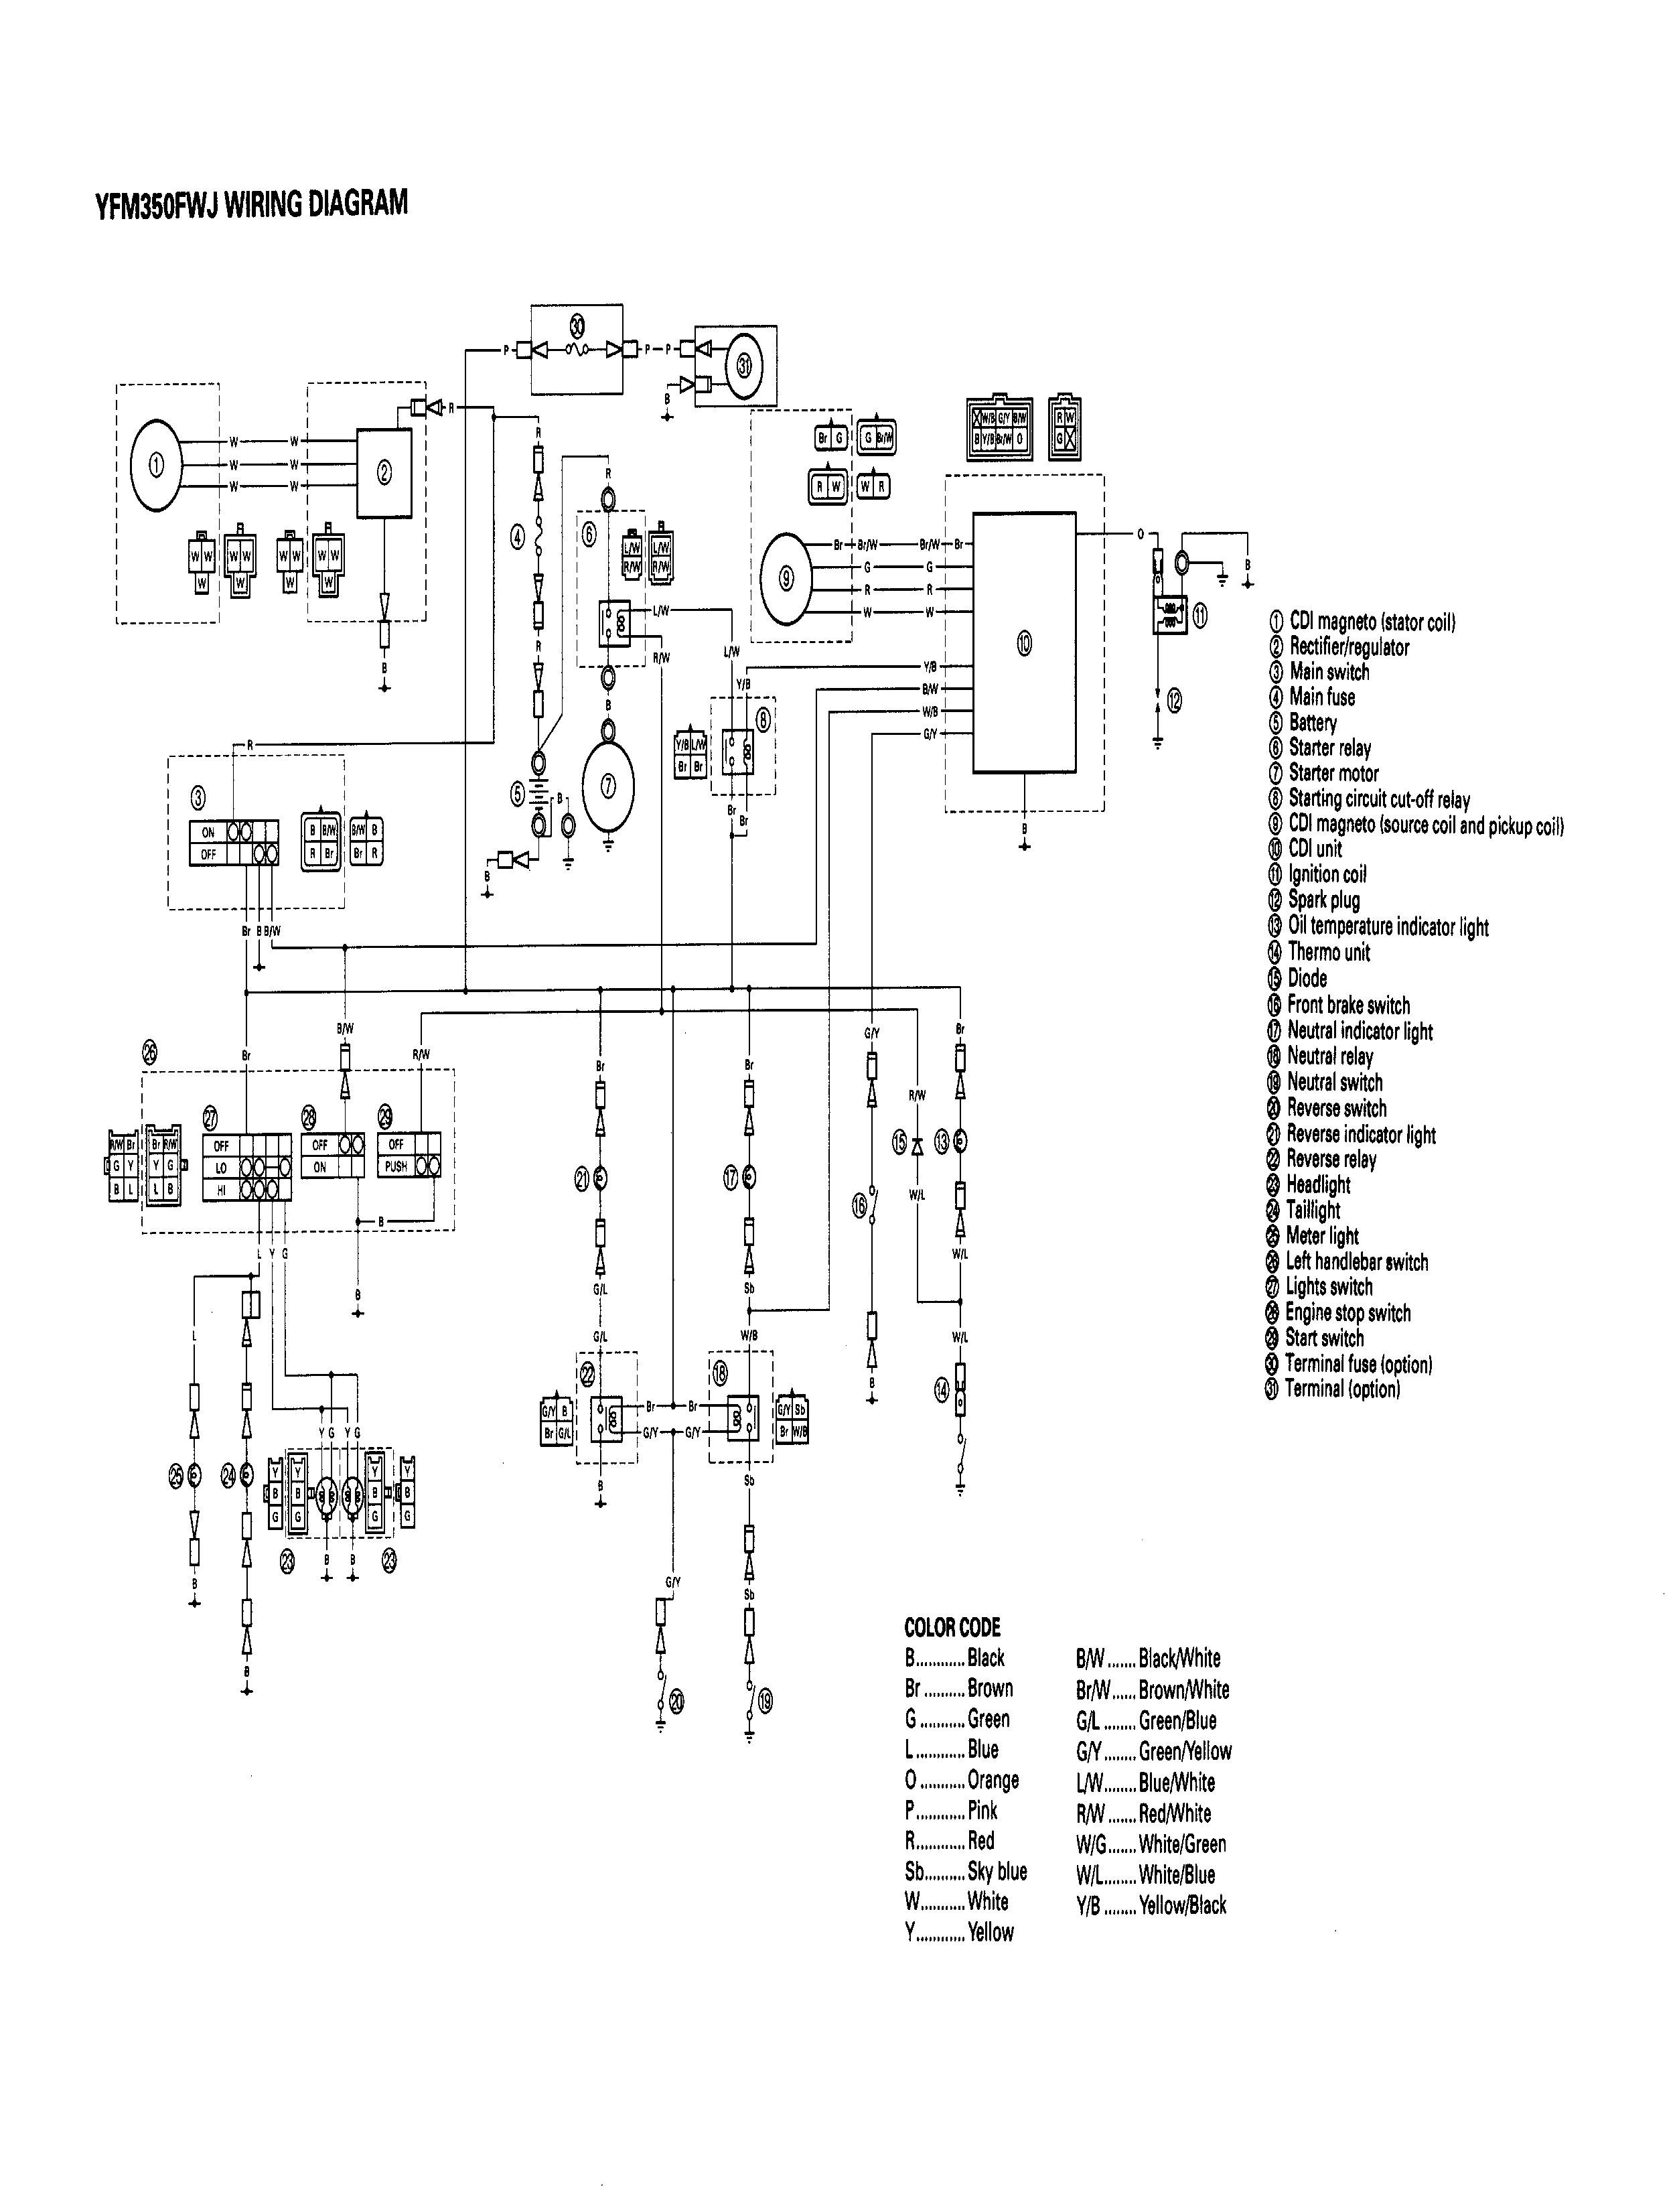 1996 Yamaha 400 Kodiak Wiring From Battery Terminal 1996 Bigbear 350 4×4 Wiring Of 1996 Yamaha 400 Kodiak Wiring From Battery Terminal